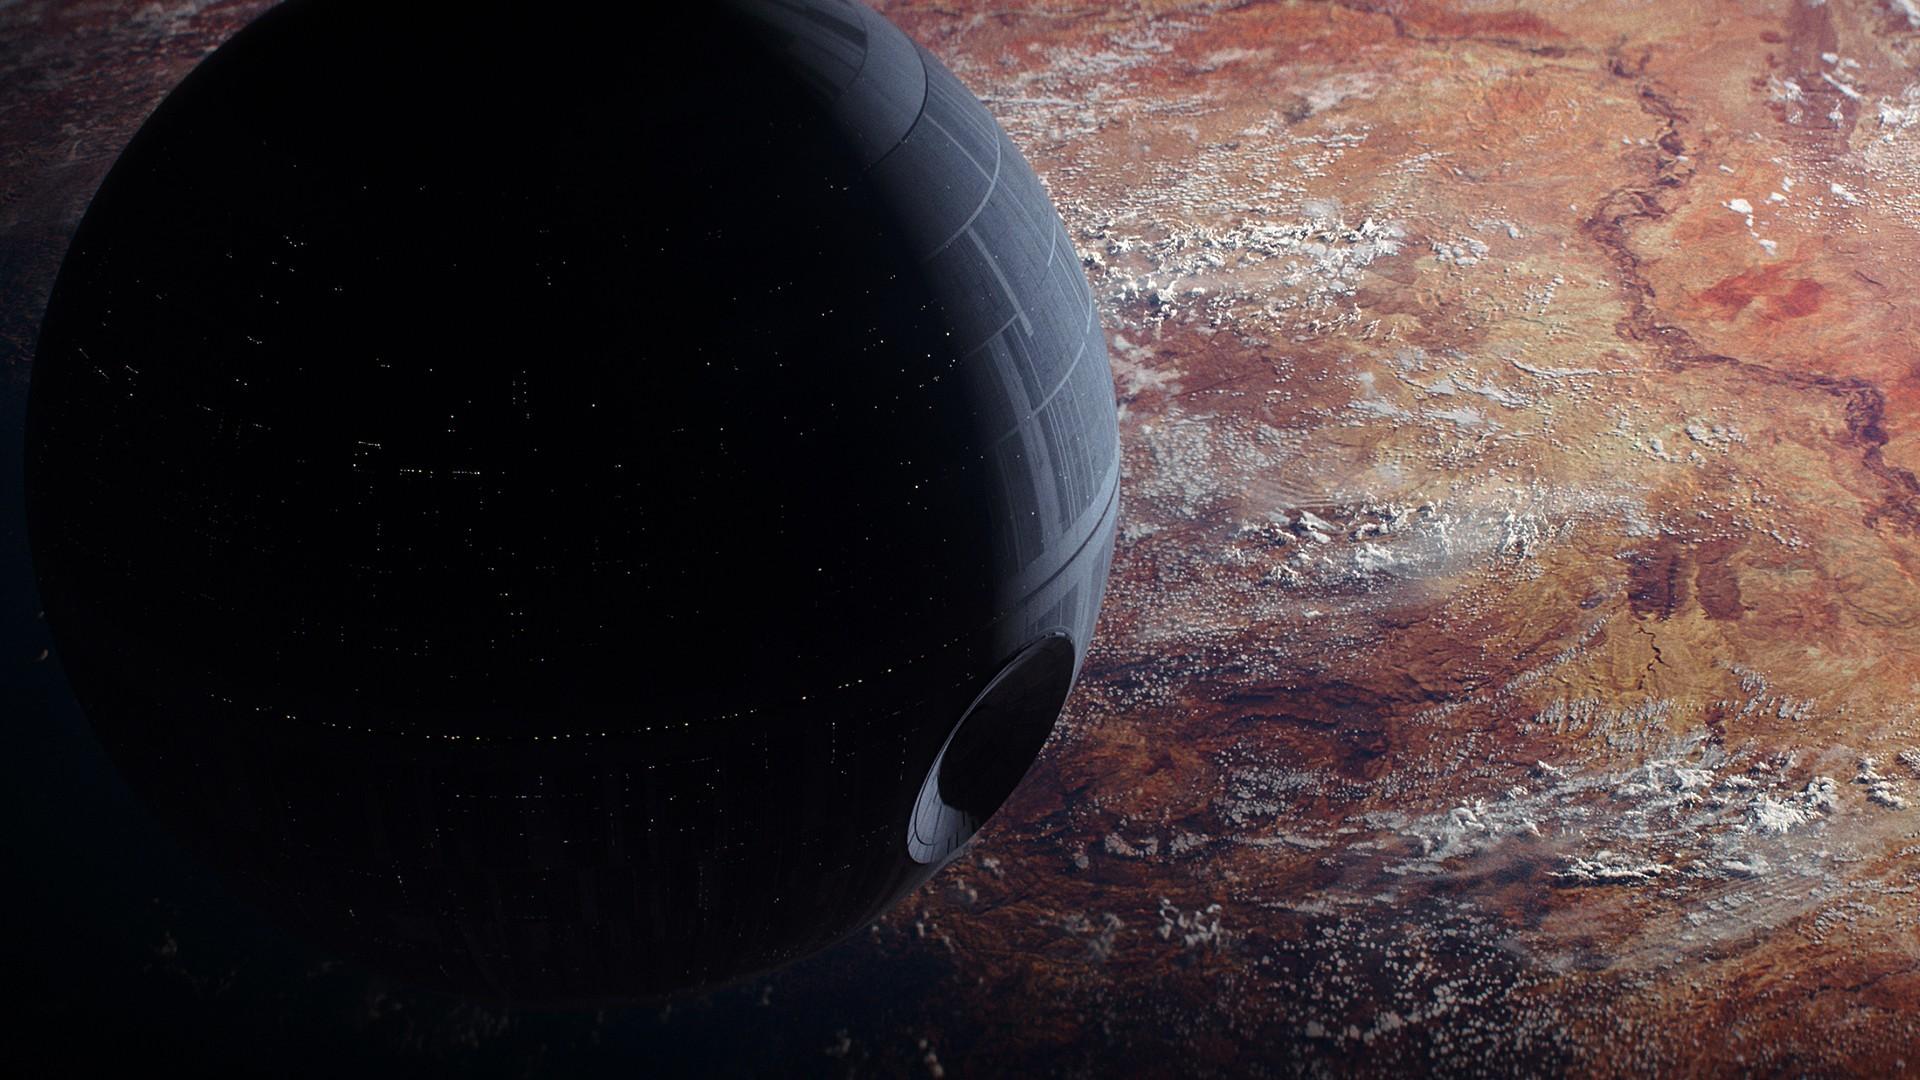 Download Star Wars, movies, Death Star, Rogue One: A Star Wars Story  wallpaper (ID 63173434) – 8PXLS